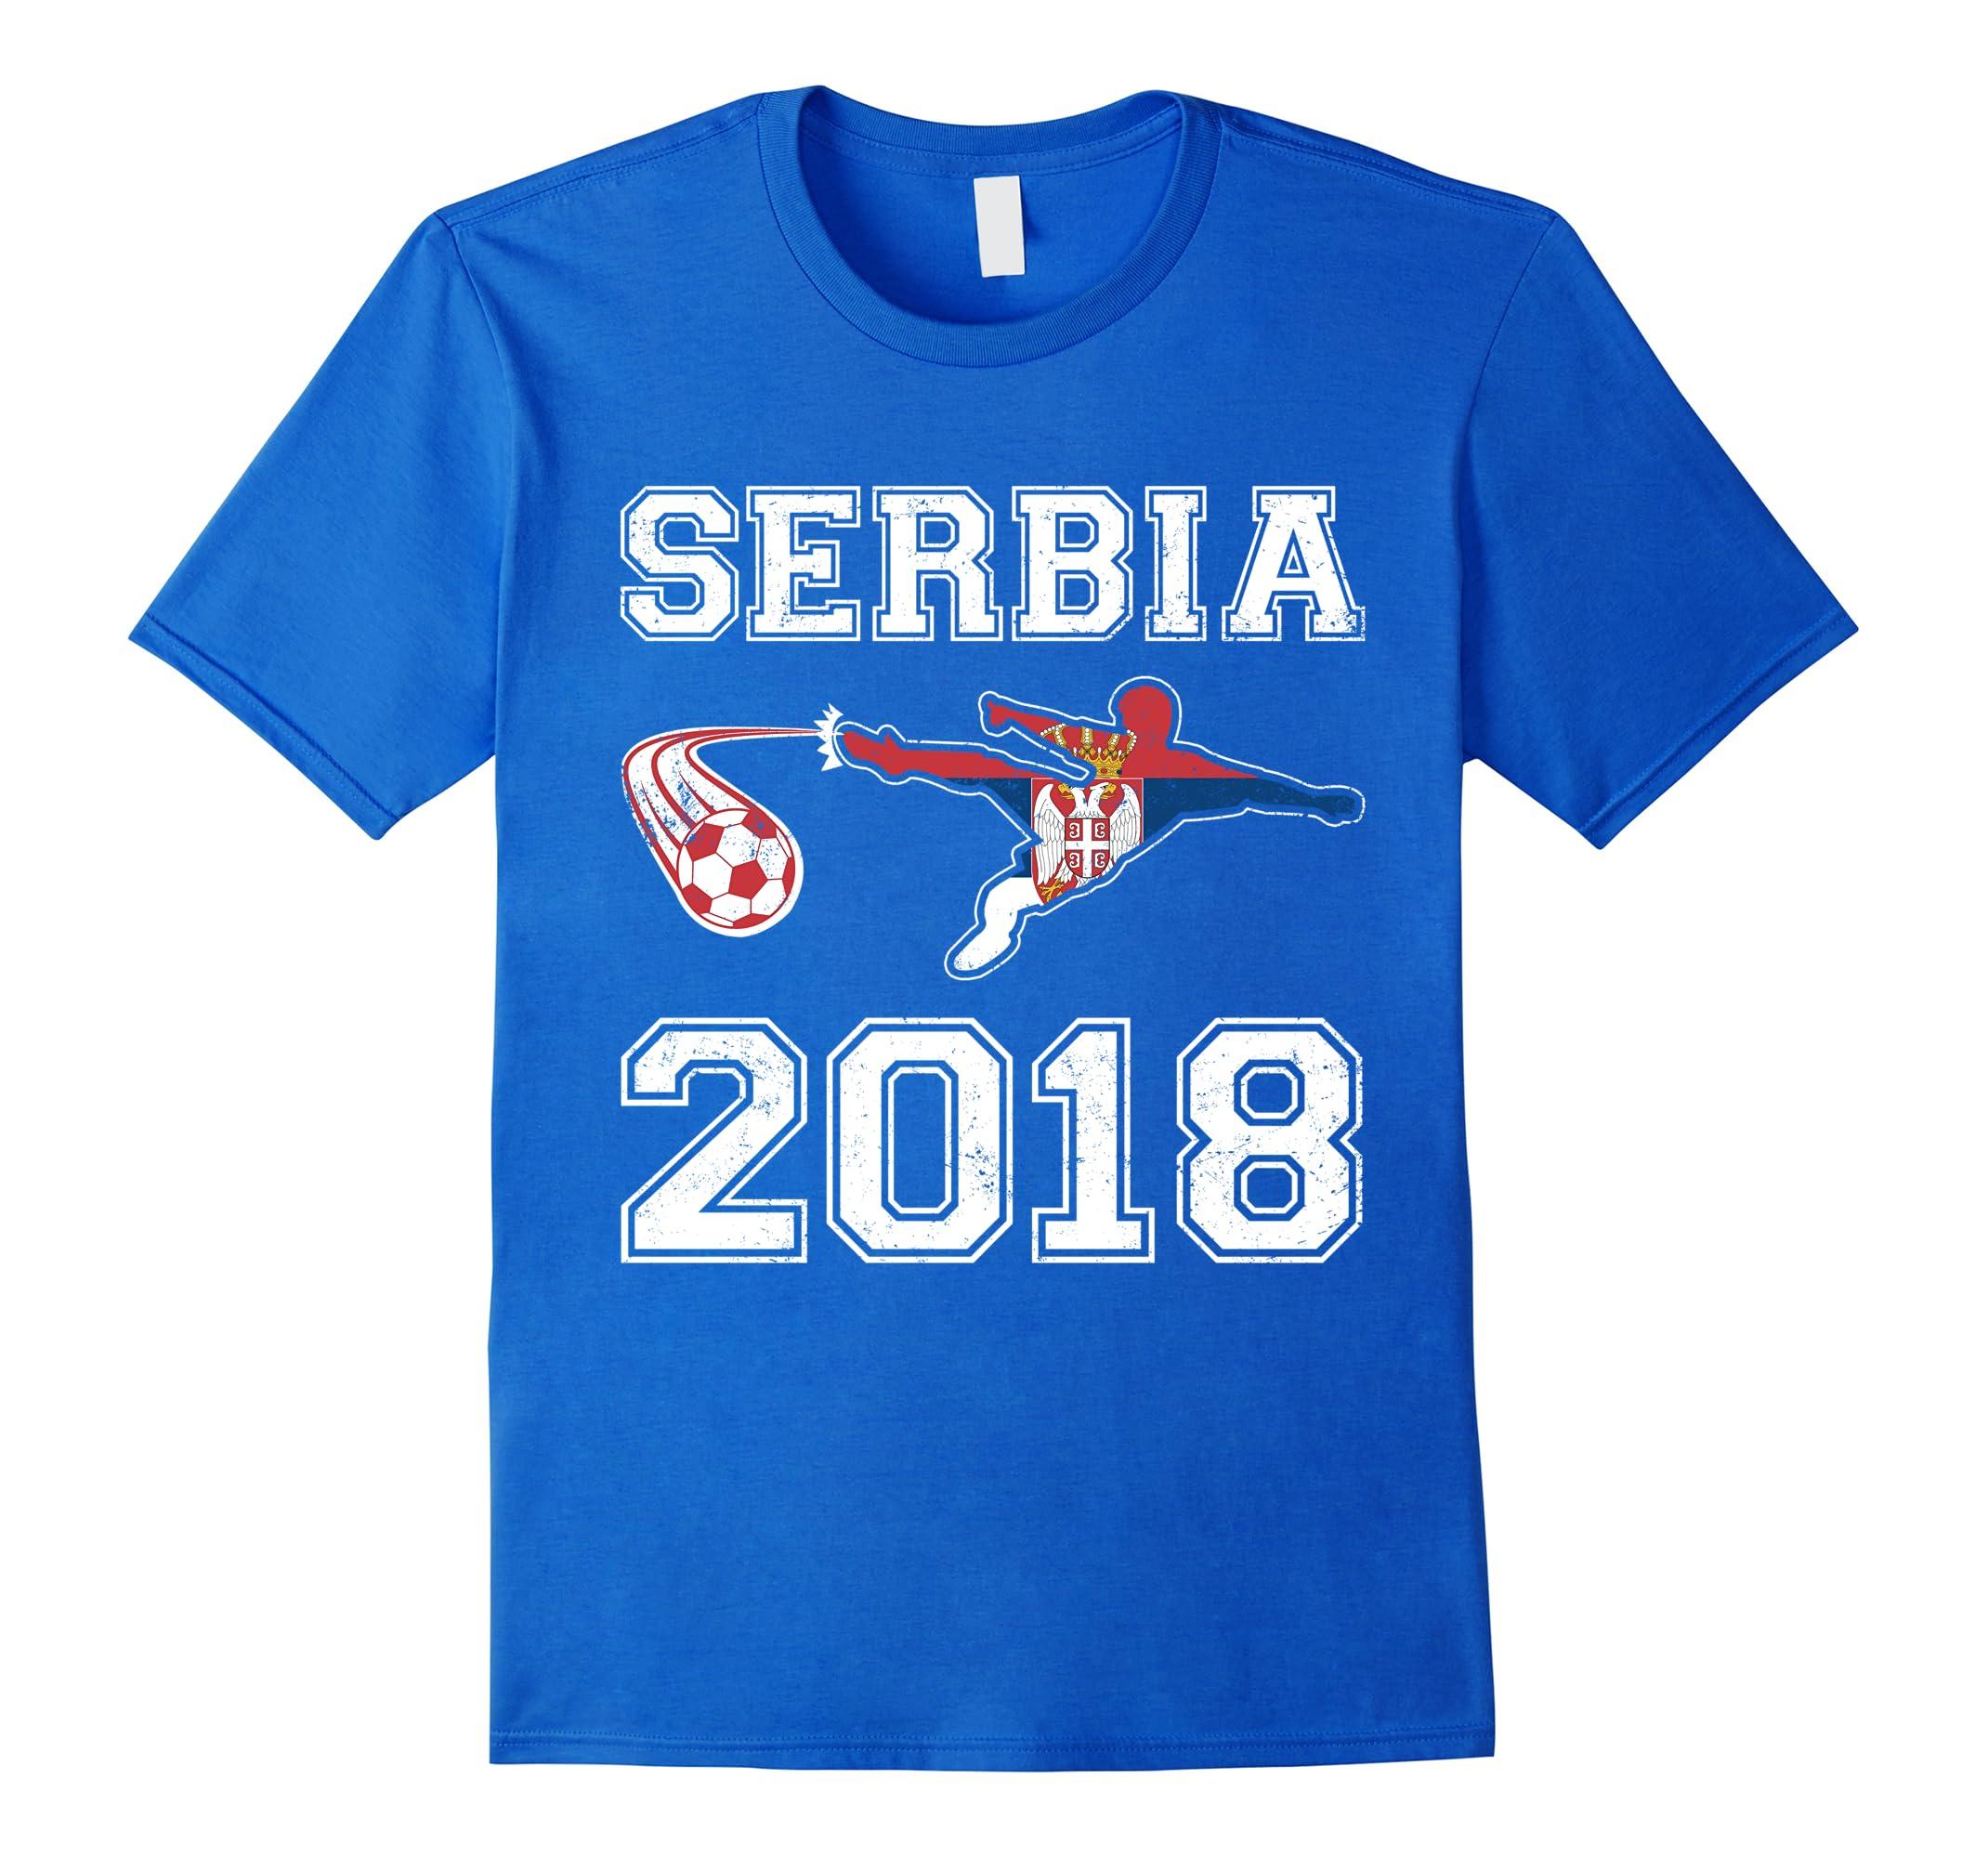 Serbia Soccer Representation 2018 Champion Shirt-RT